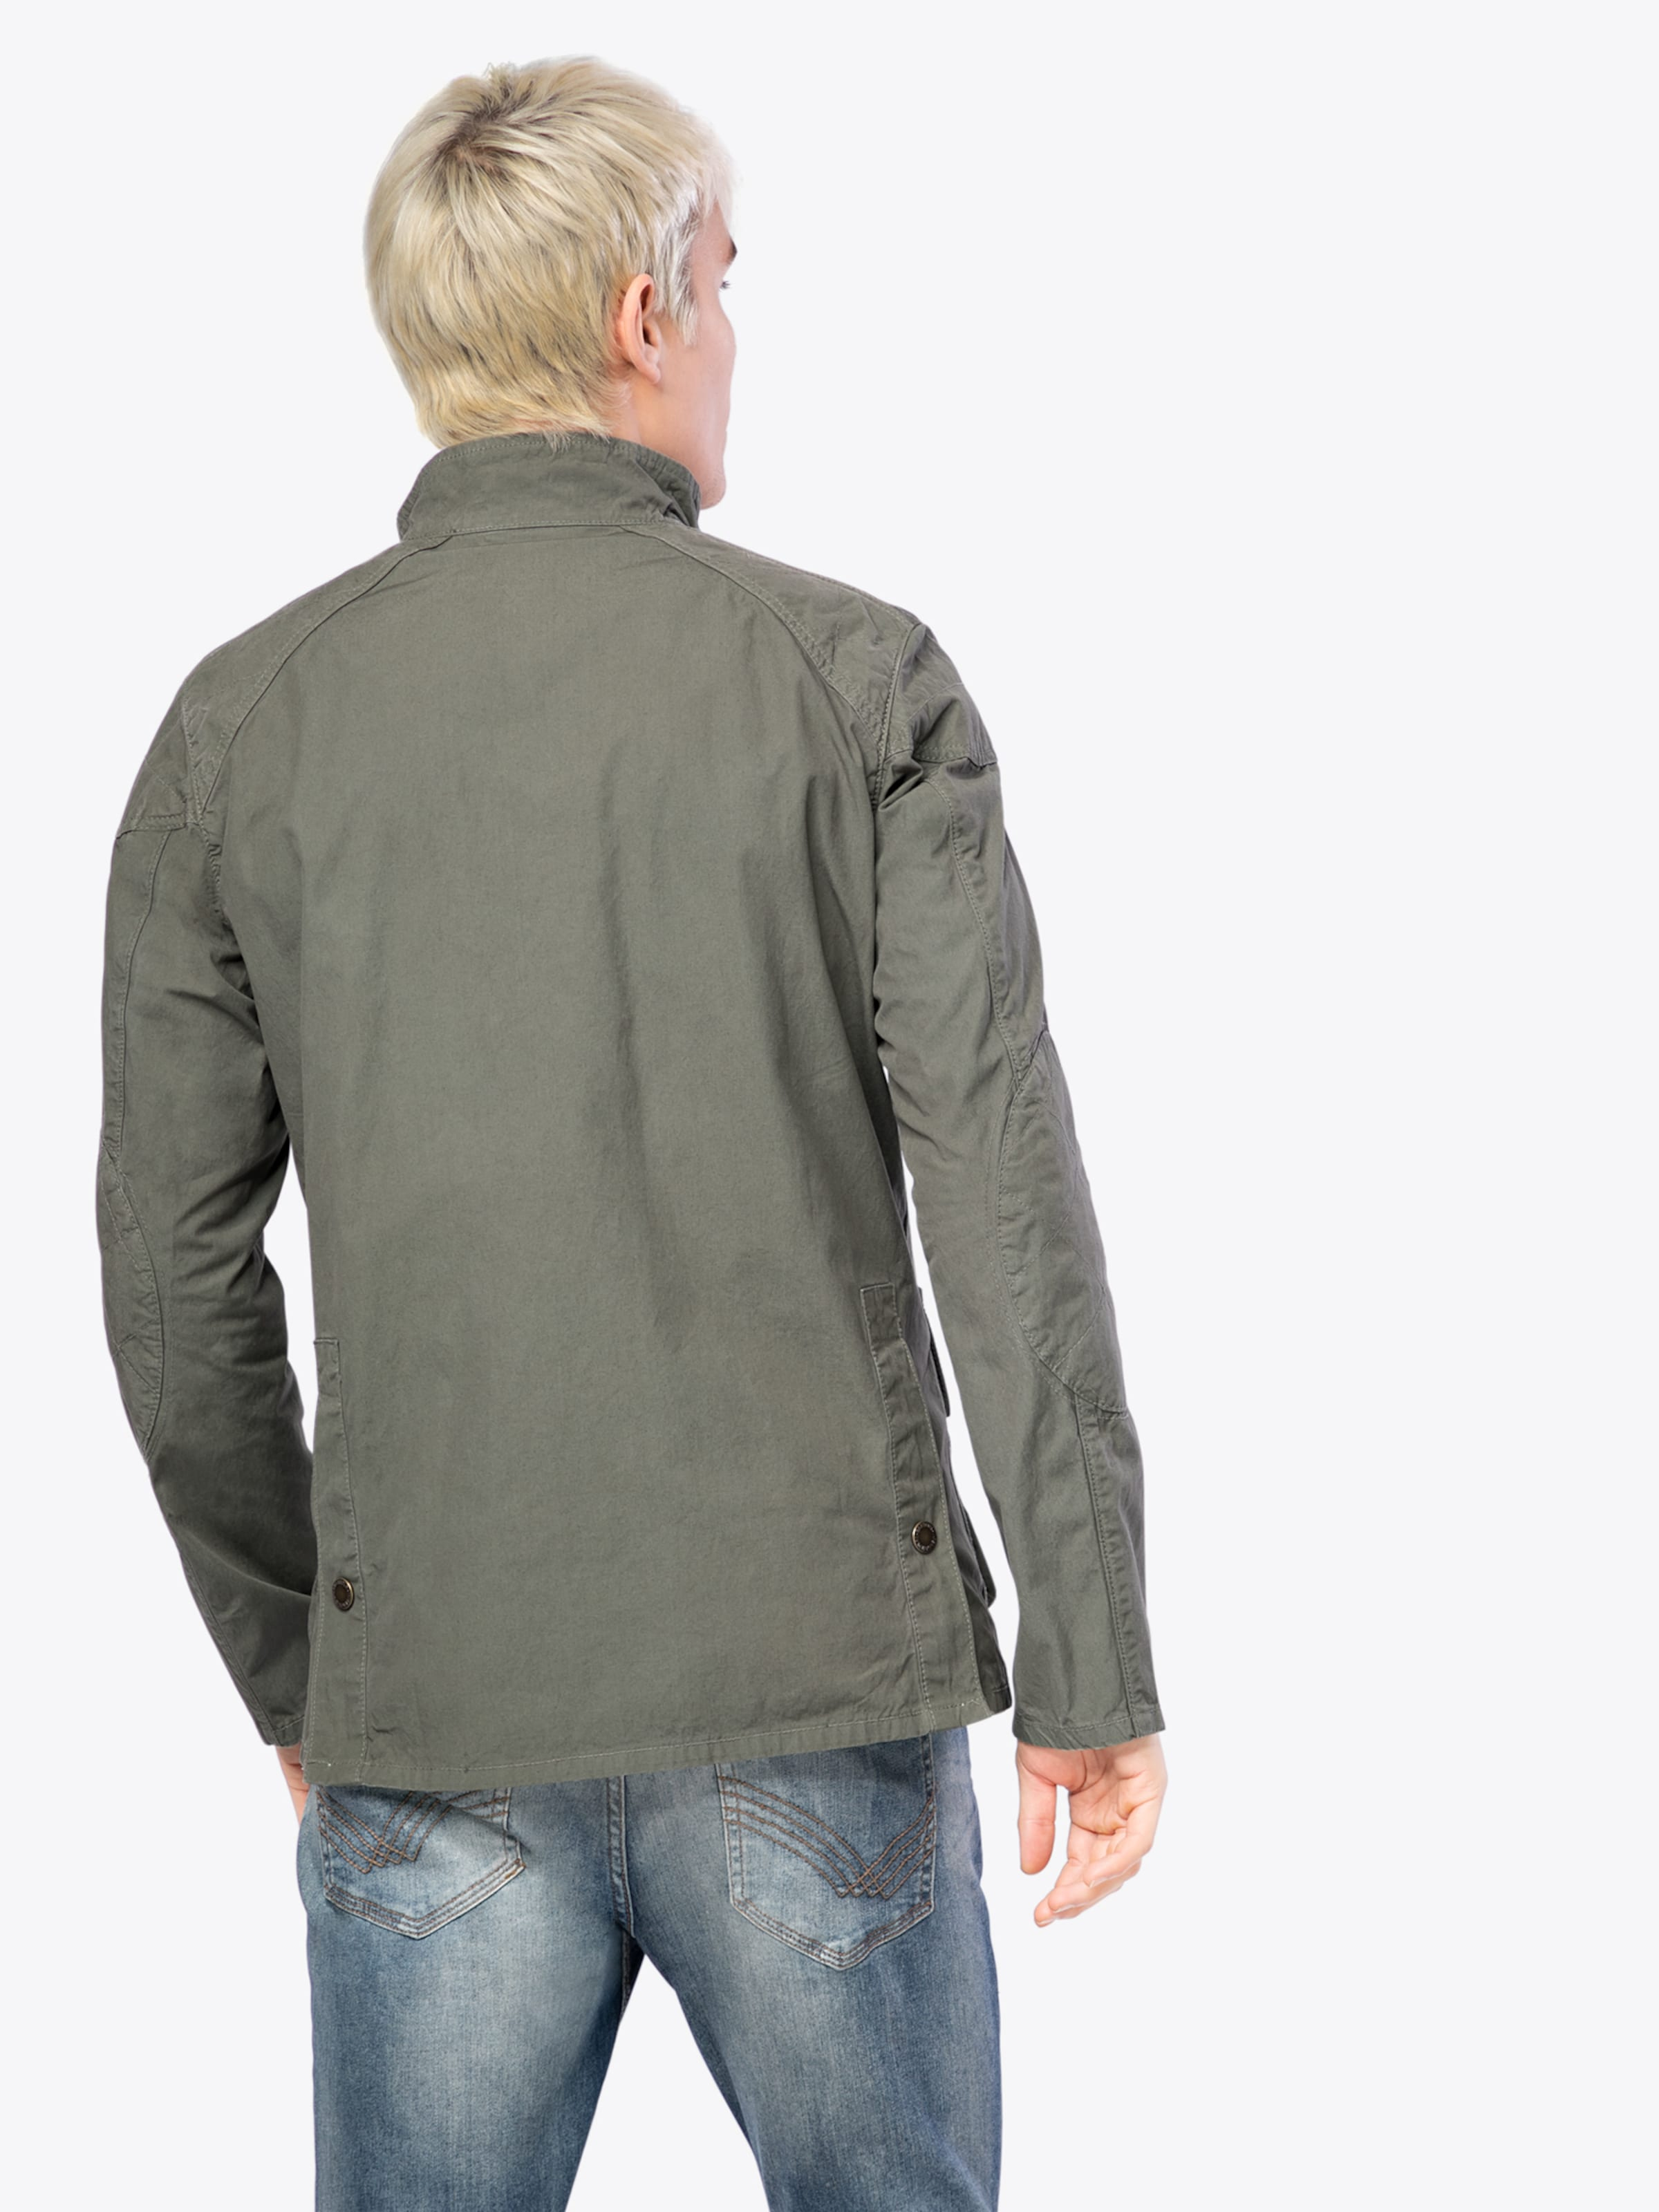 Sehr Billig Spielraum Niedrigen Preis Versandgebühr Barbour International Jacke 'B. Intl Smokey Jacket' CLb1p